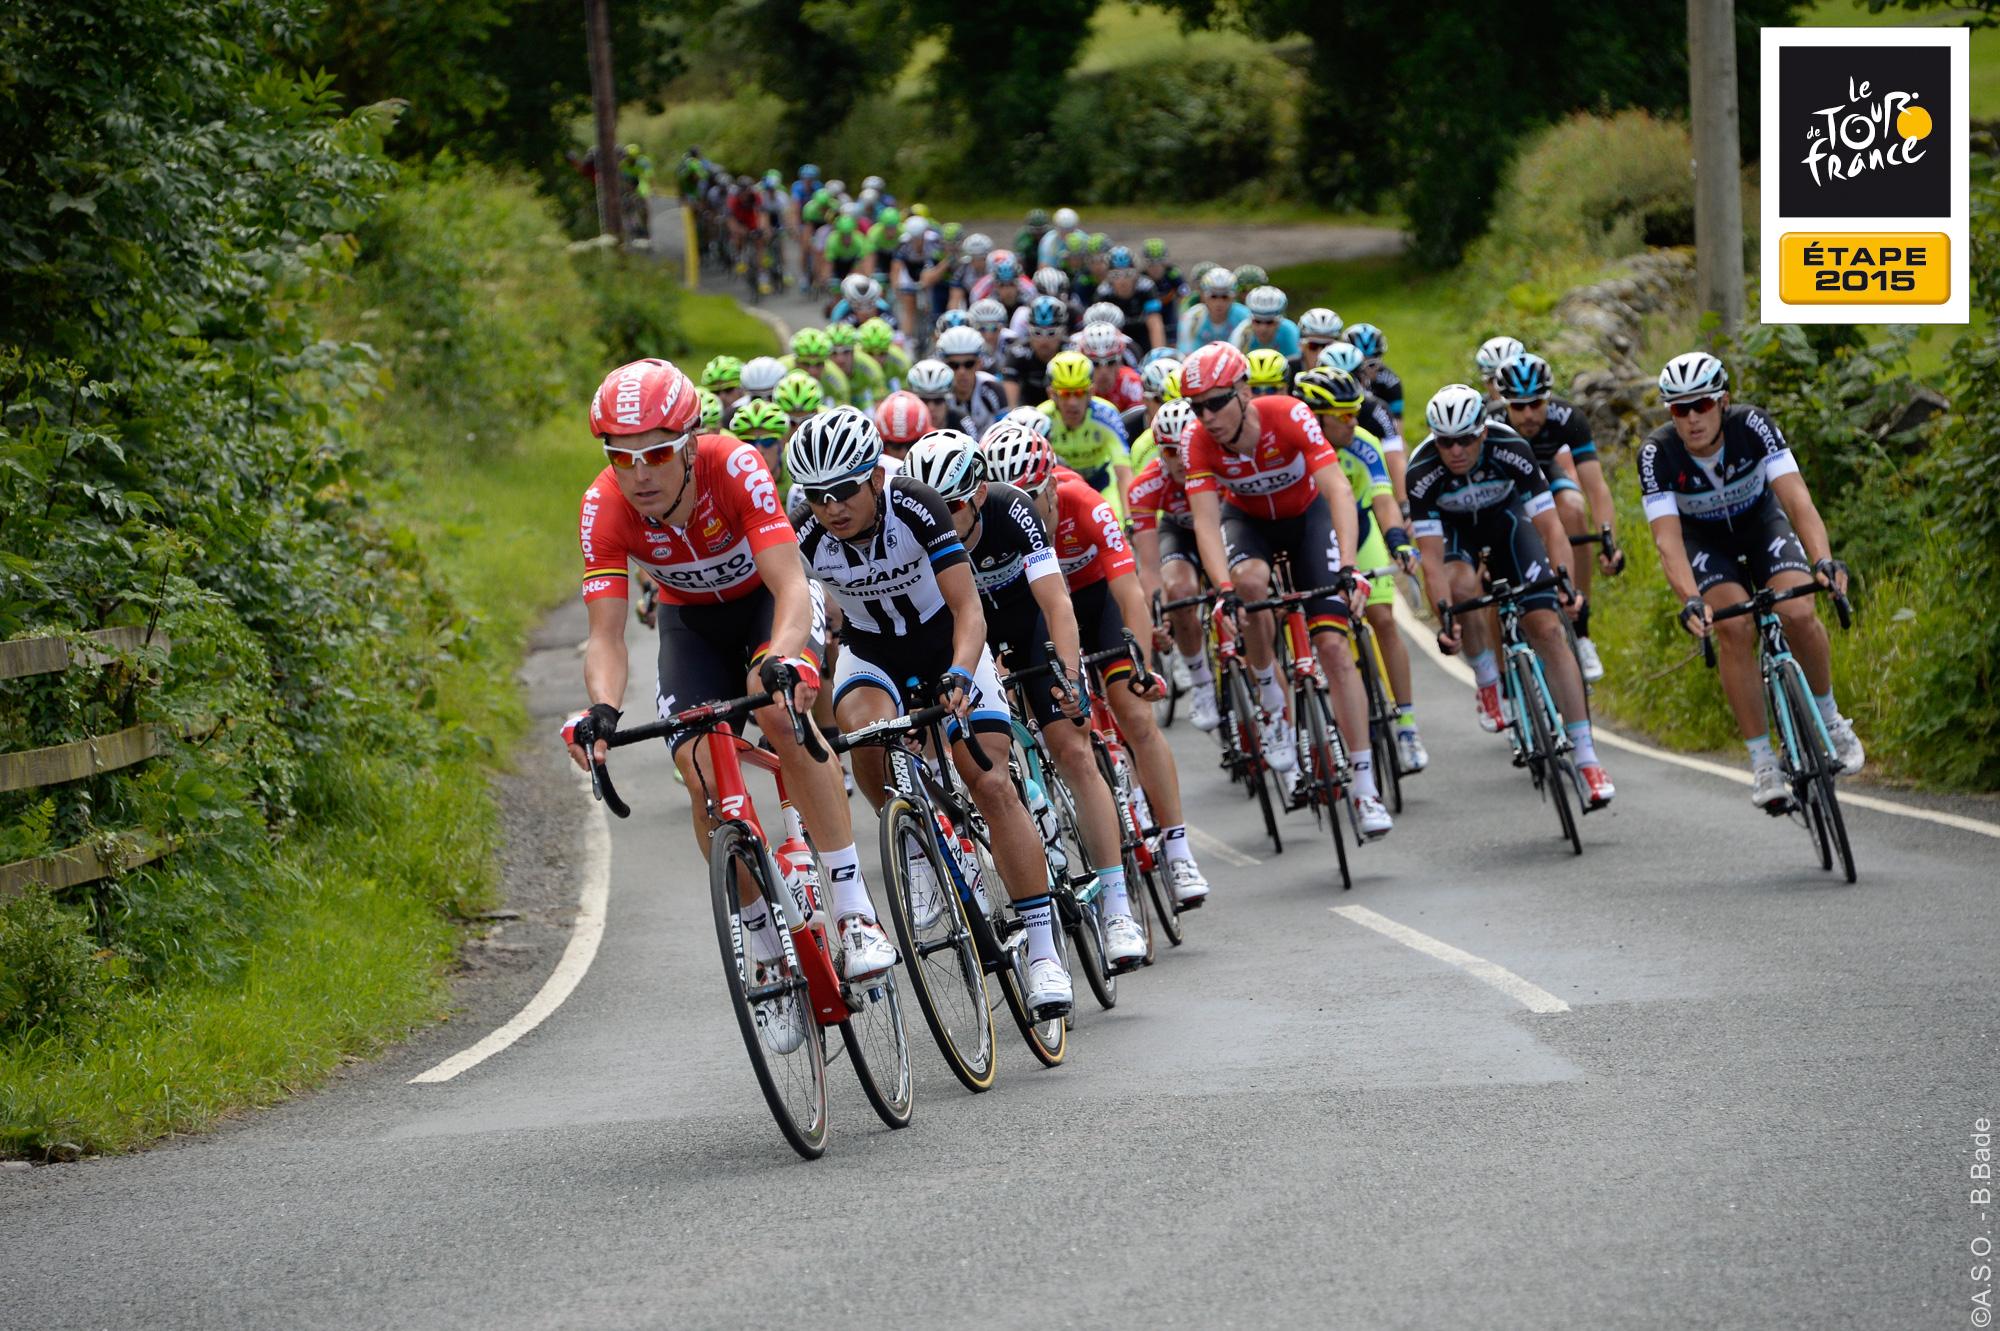 Tour de France © A.S.O.-B.Bade